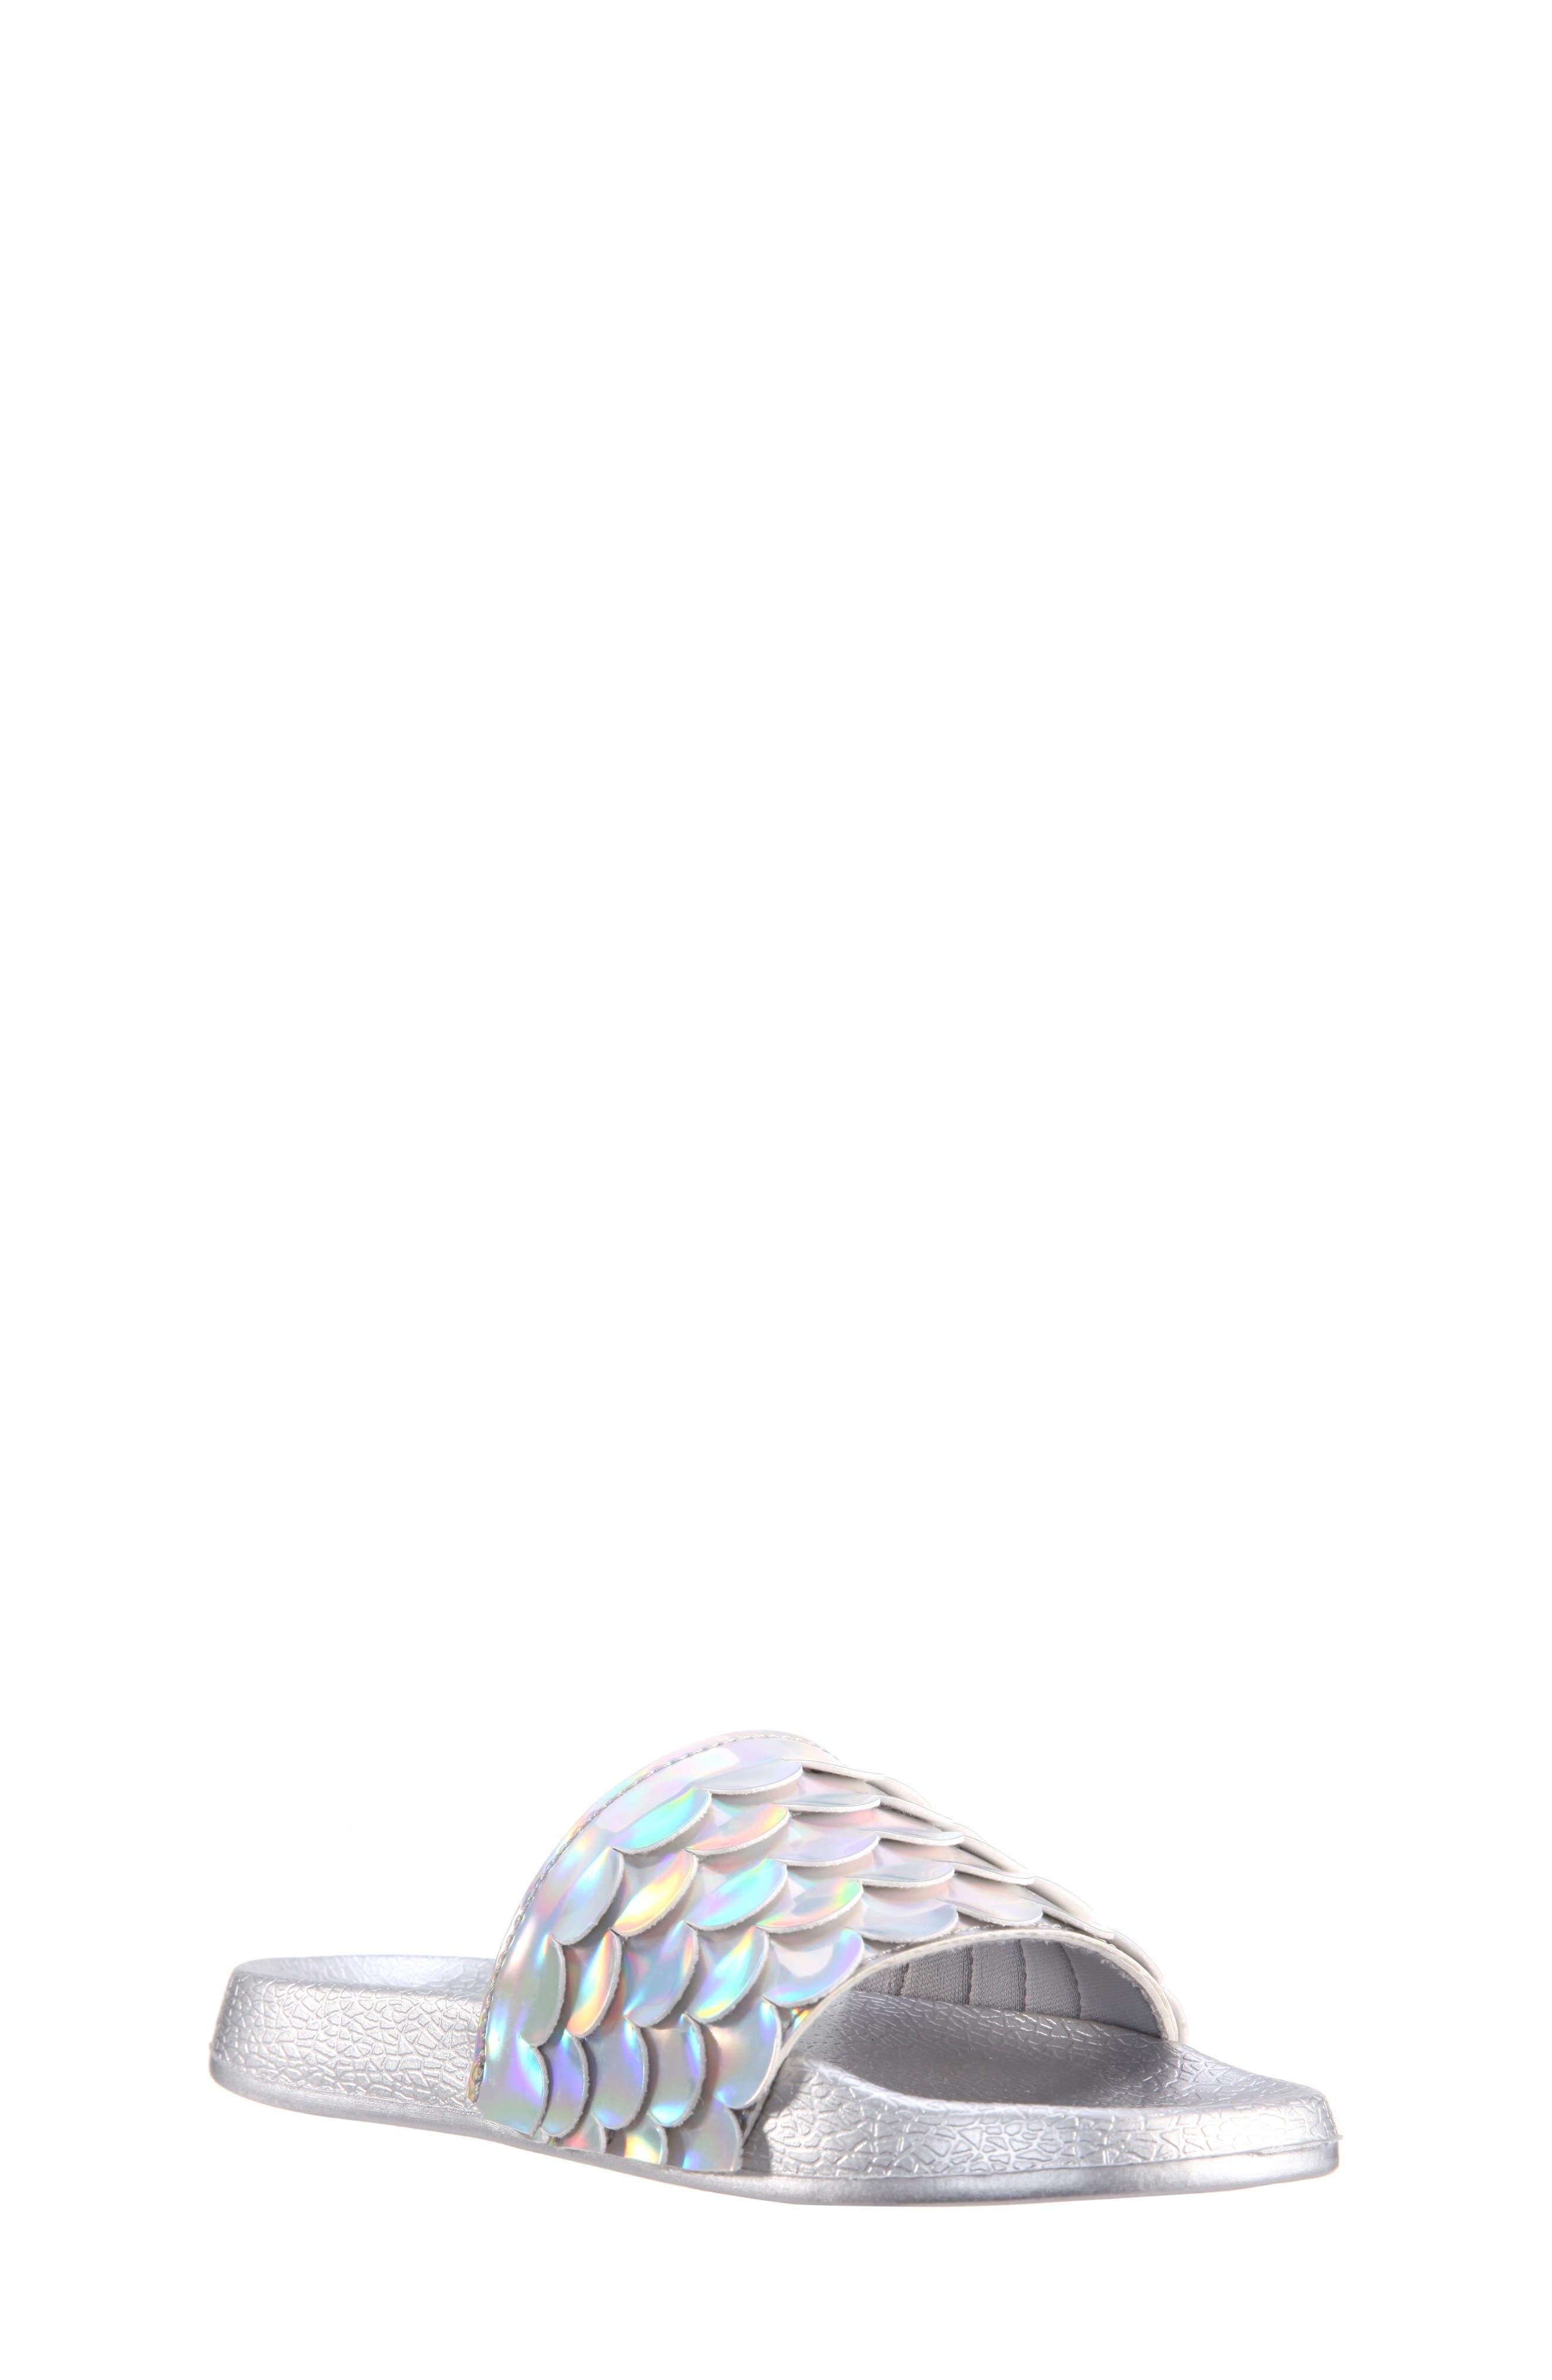 Mermaid Sport Slide Sandal,                             Main thumbnail 1, color,                             Silver Mirror Metallic